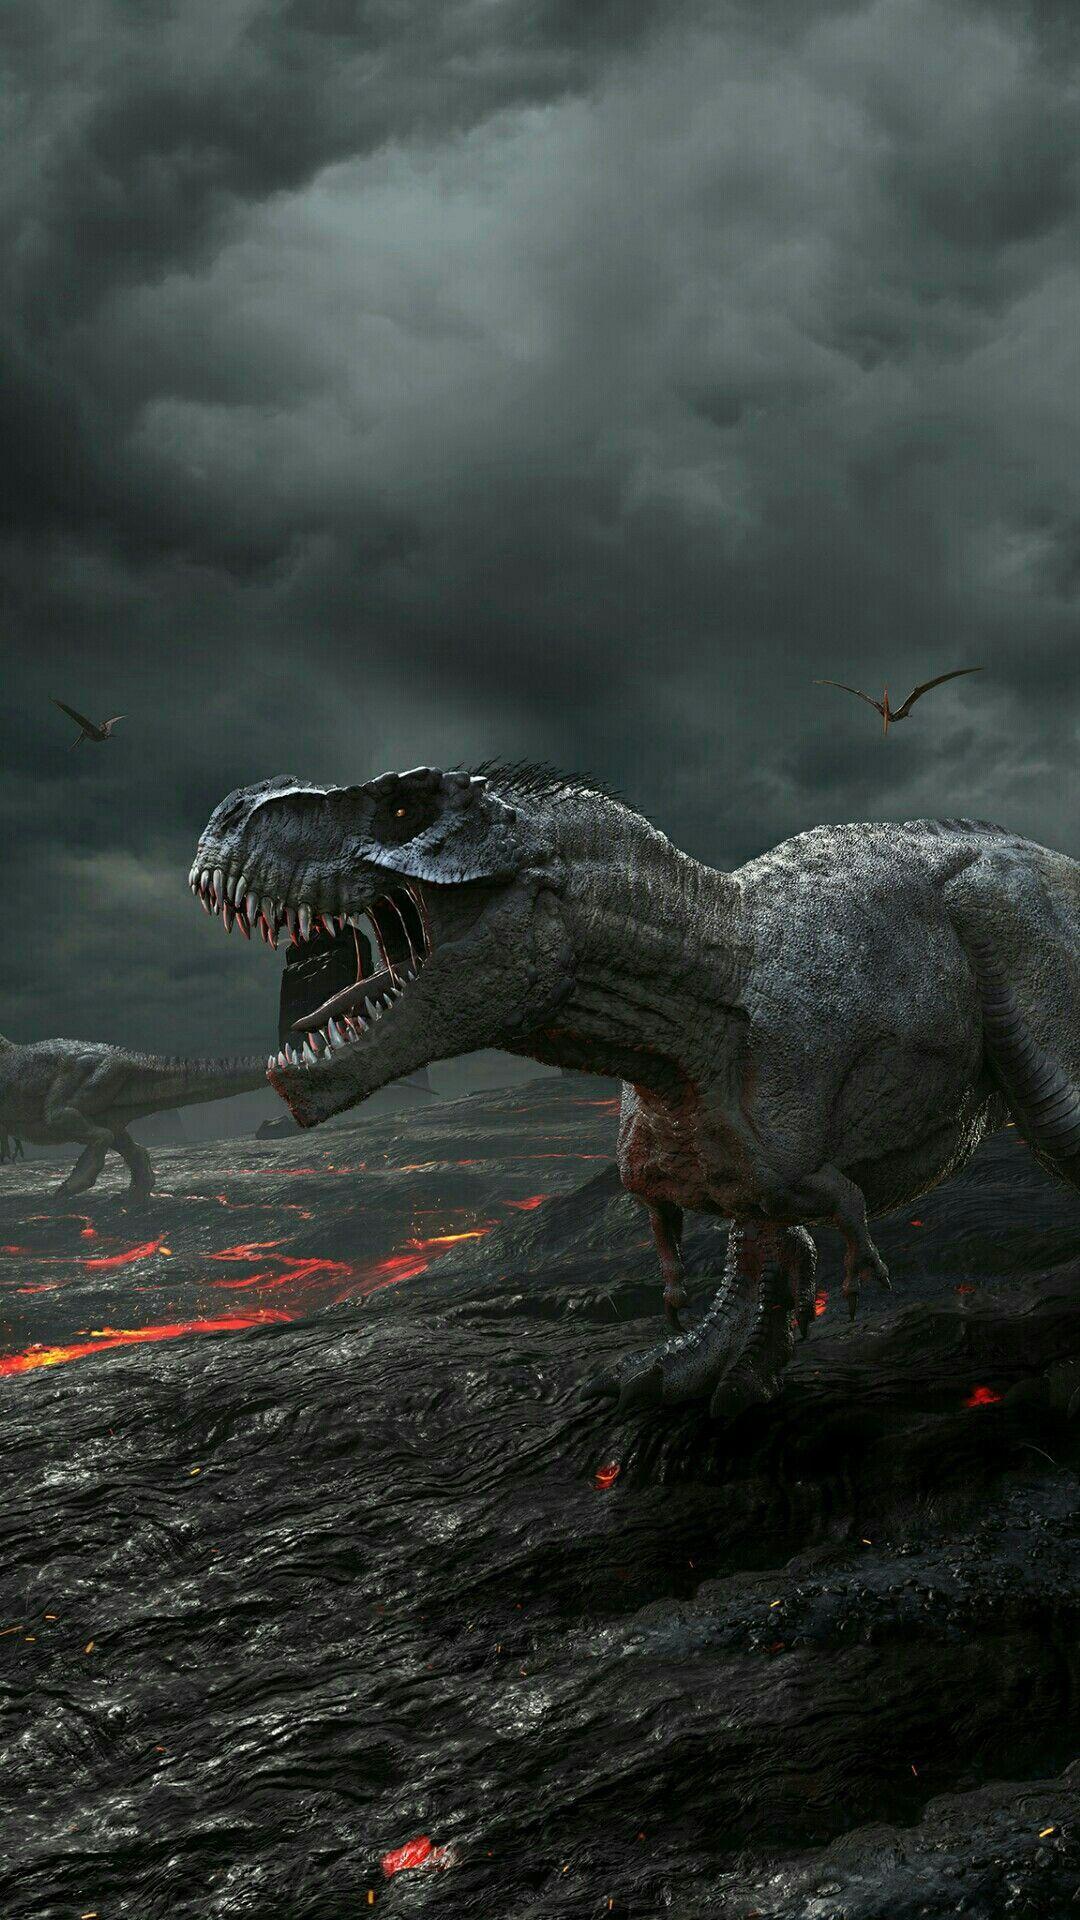 Indominus Rex Jurassic World Photo Jurassic World Wallpaper Jurassic World Jurassic Park World